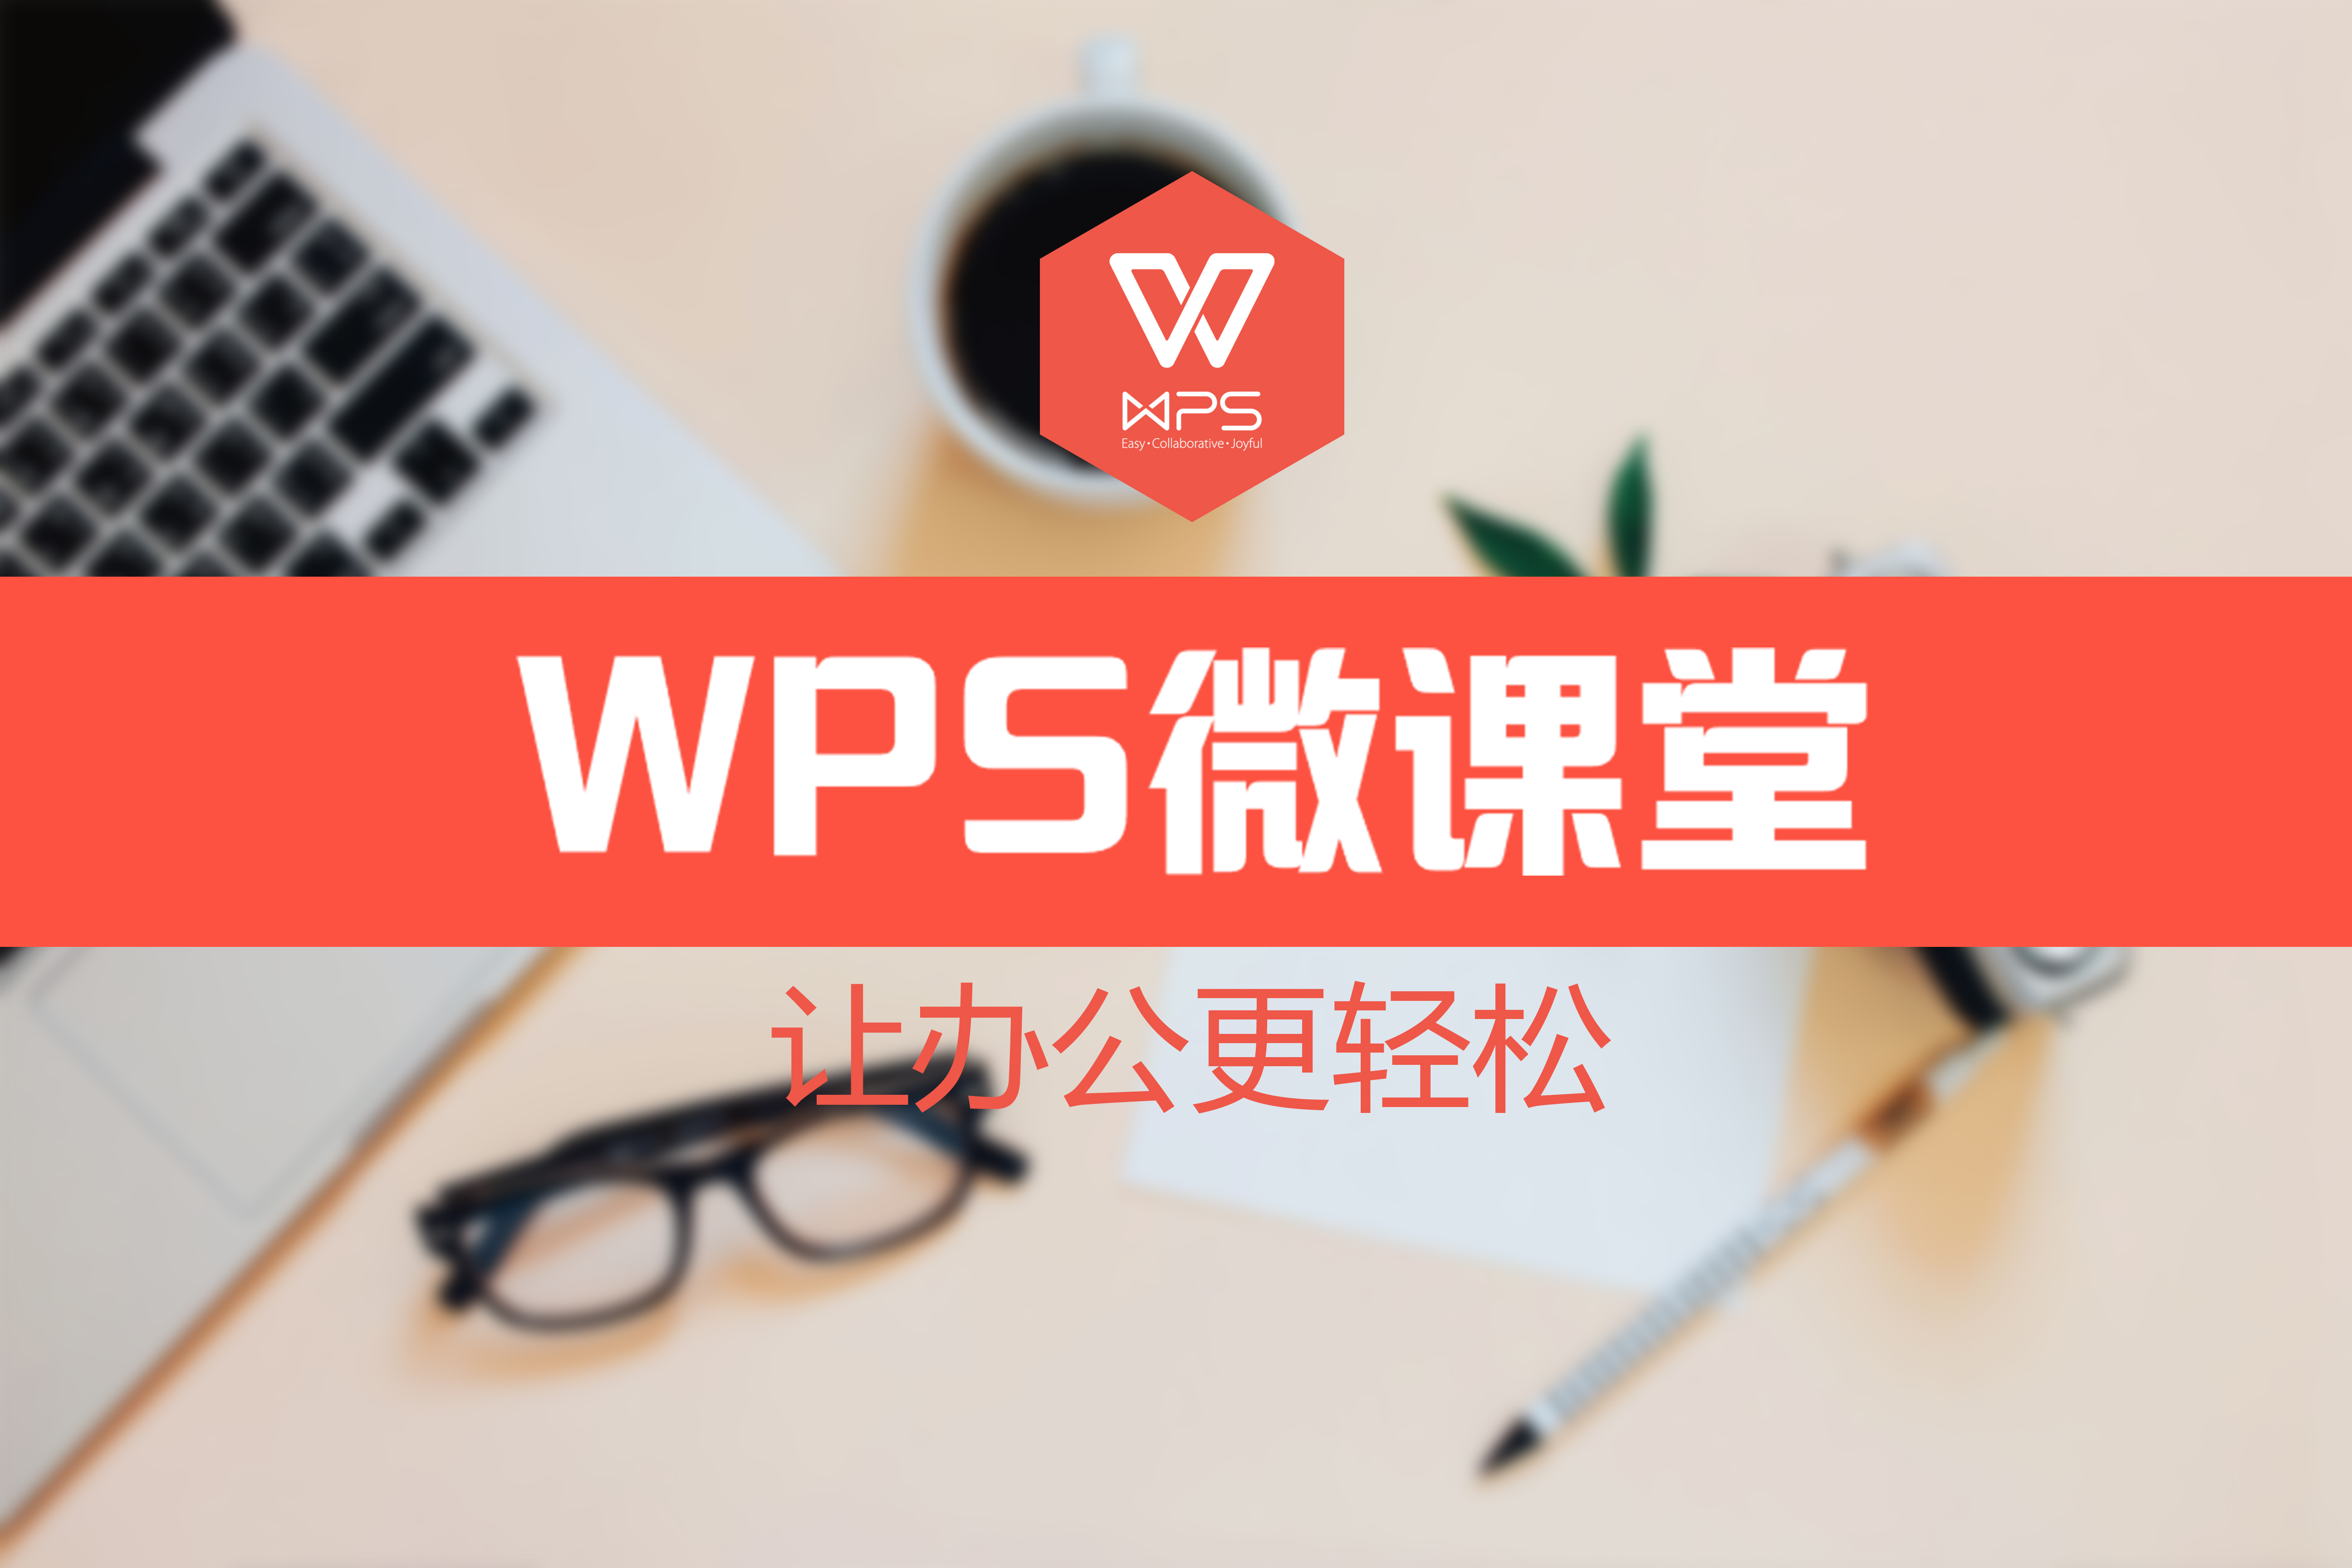 WPS Office2016版微课堂PPT演示办公技巧集锦三